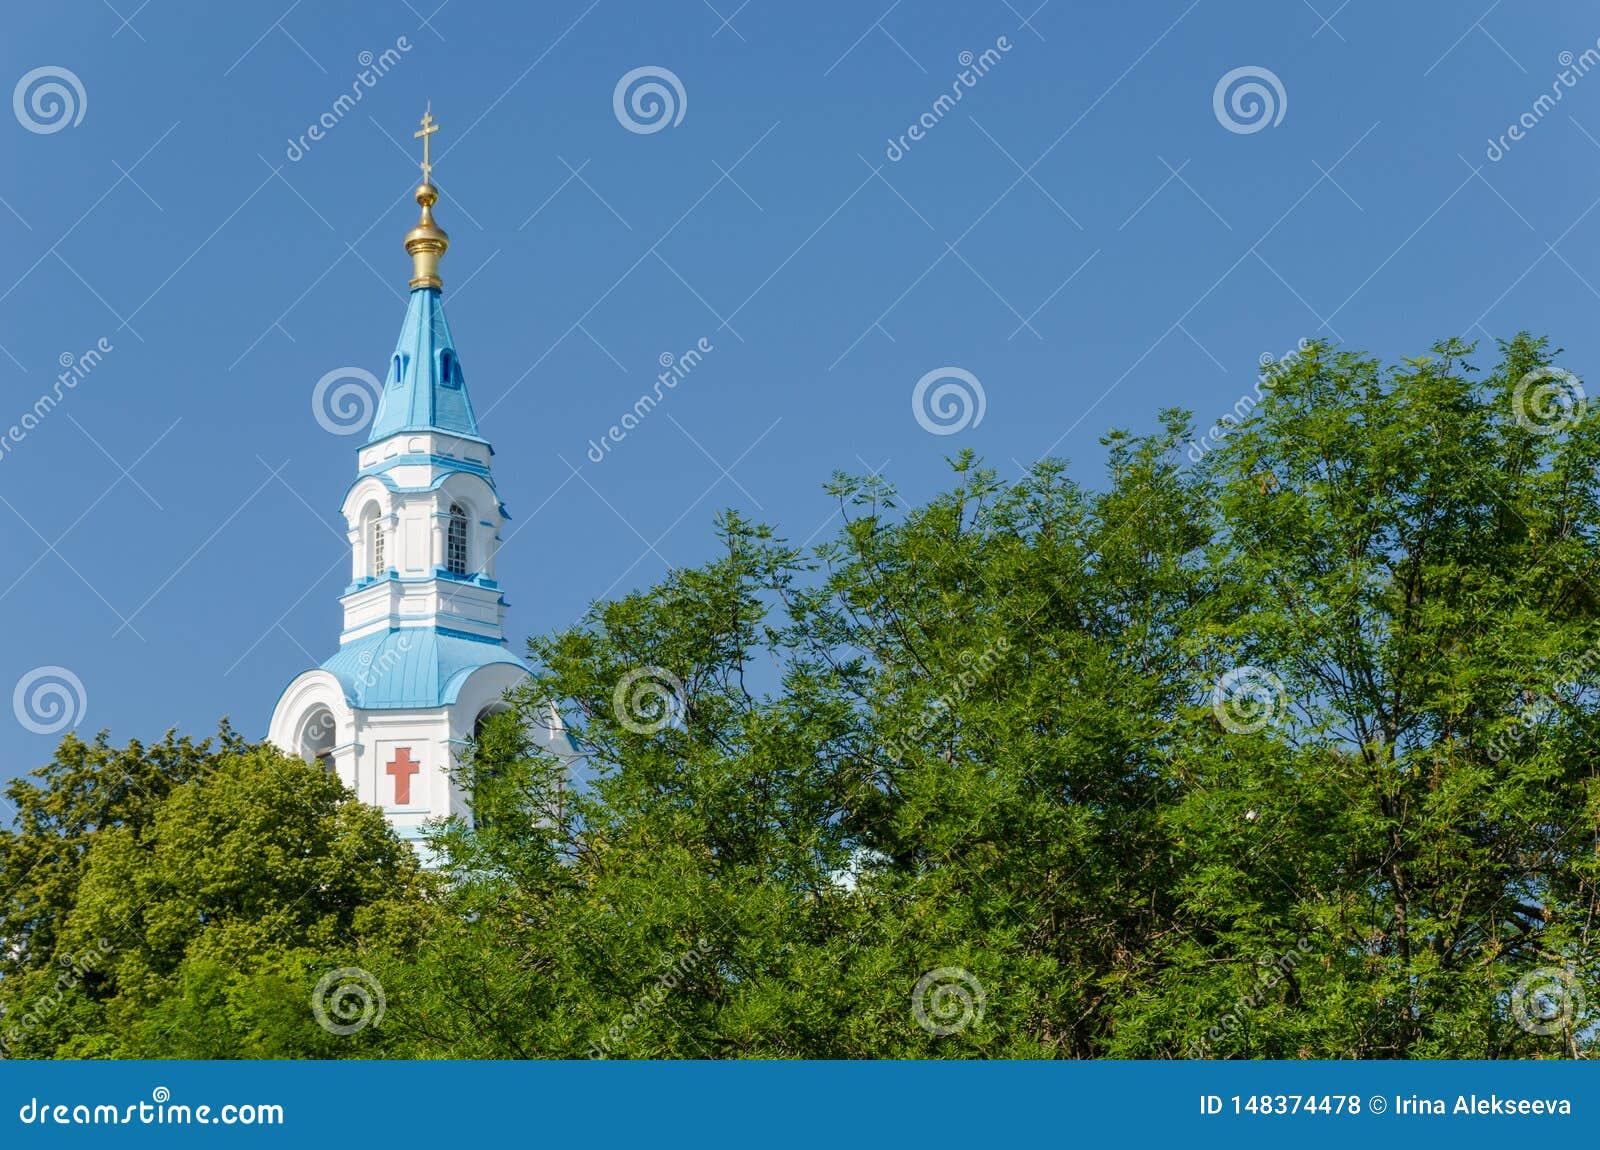 Cath?drale de Spaso-Preobrazhensky du monast?re de Valaam La tour de cloche de la cath?drale orthodoxe ?le de Valaam, Car?lie, Ru